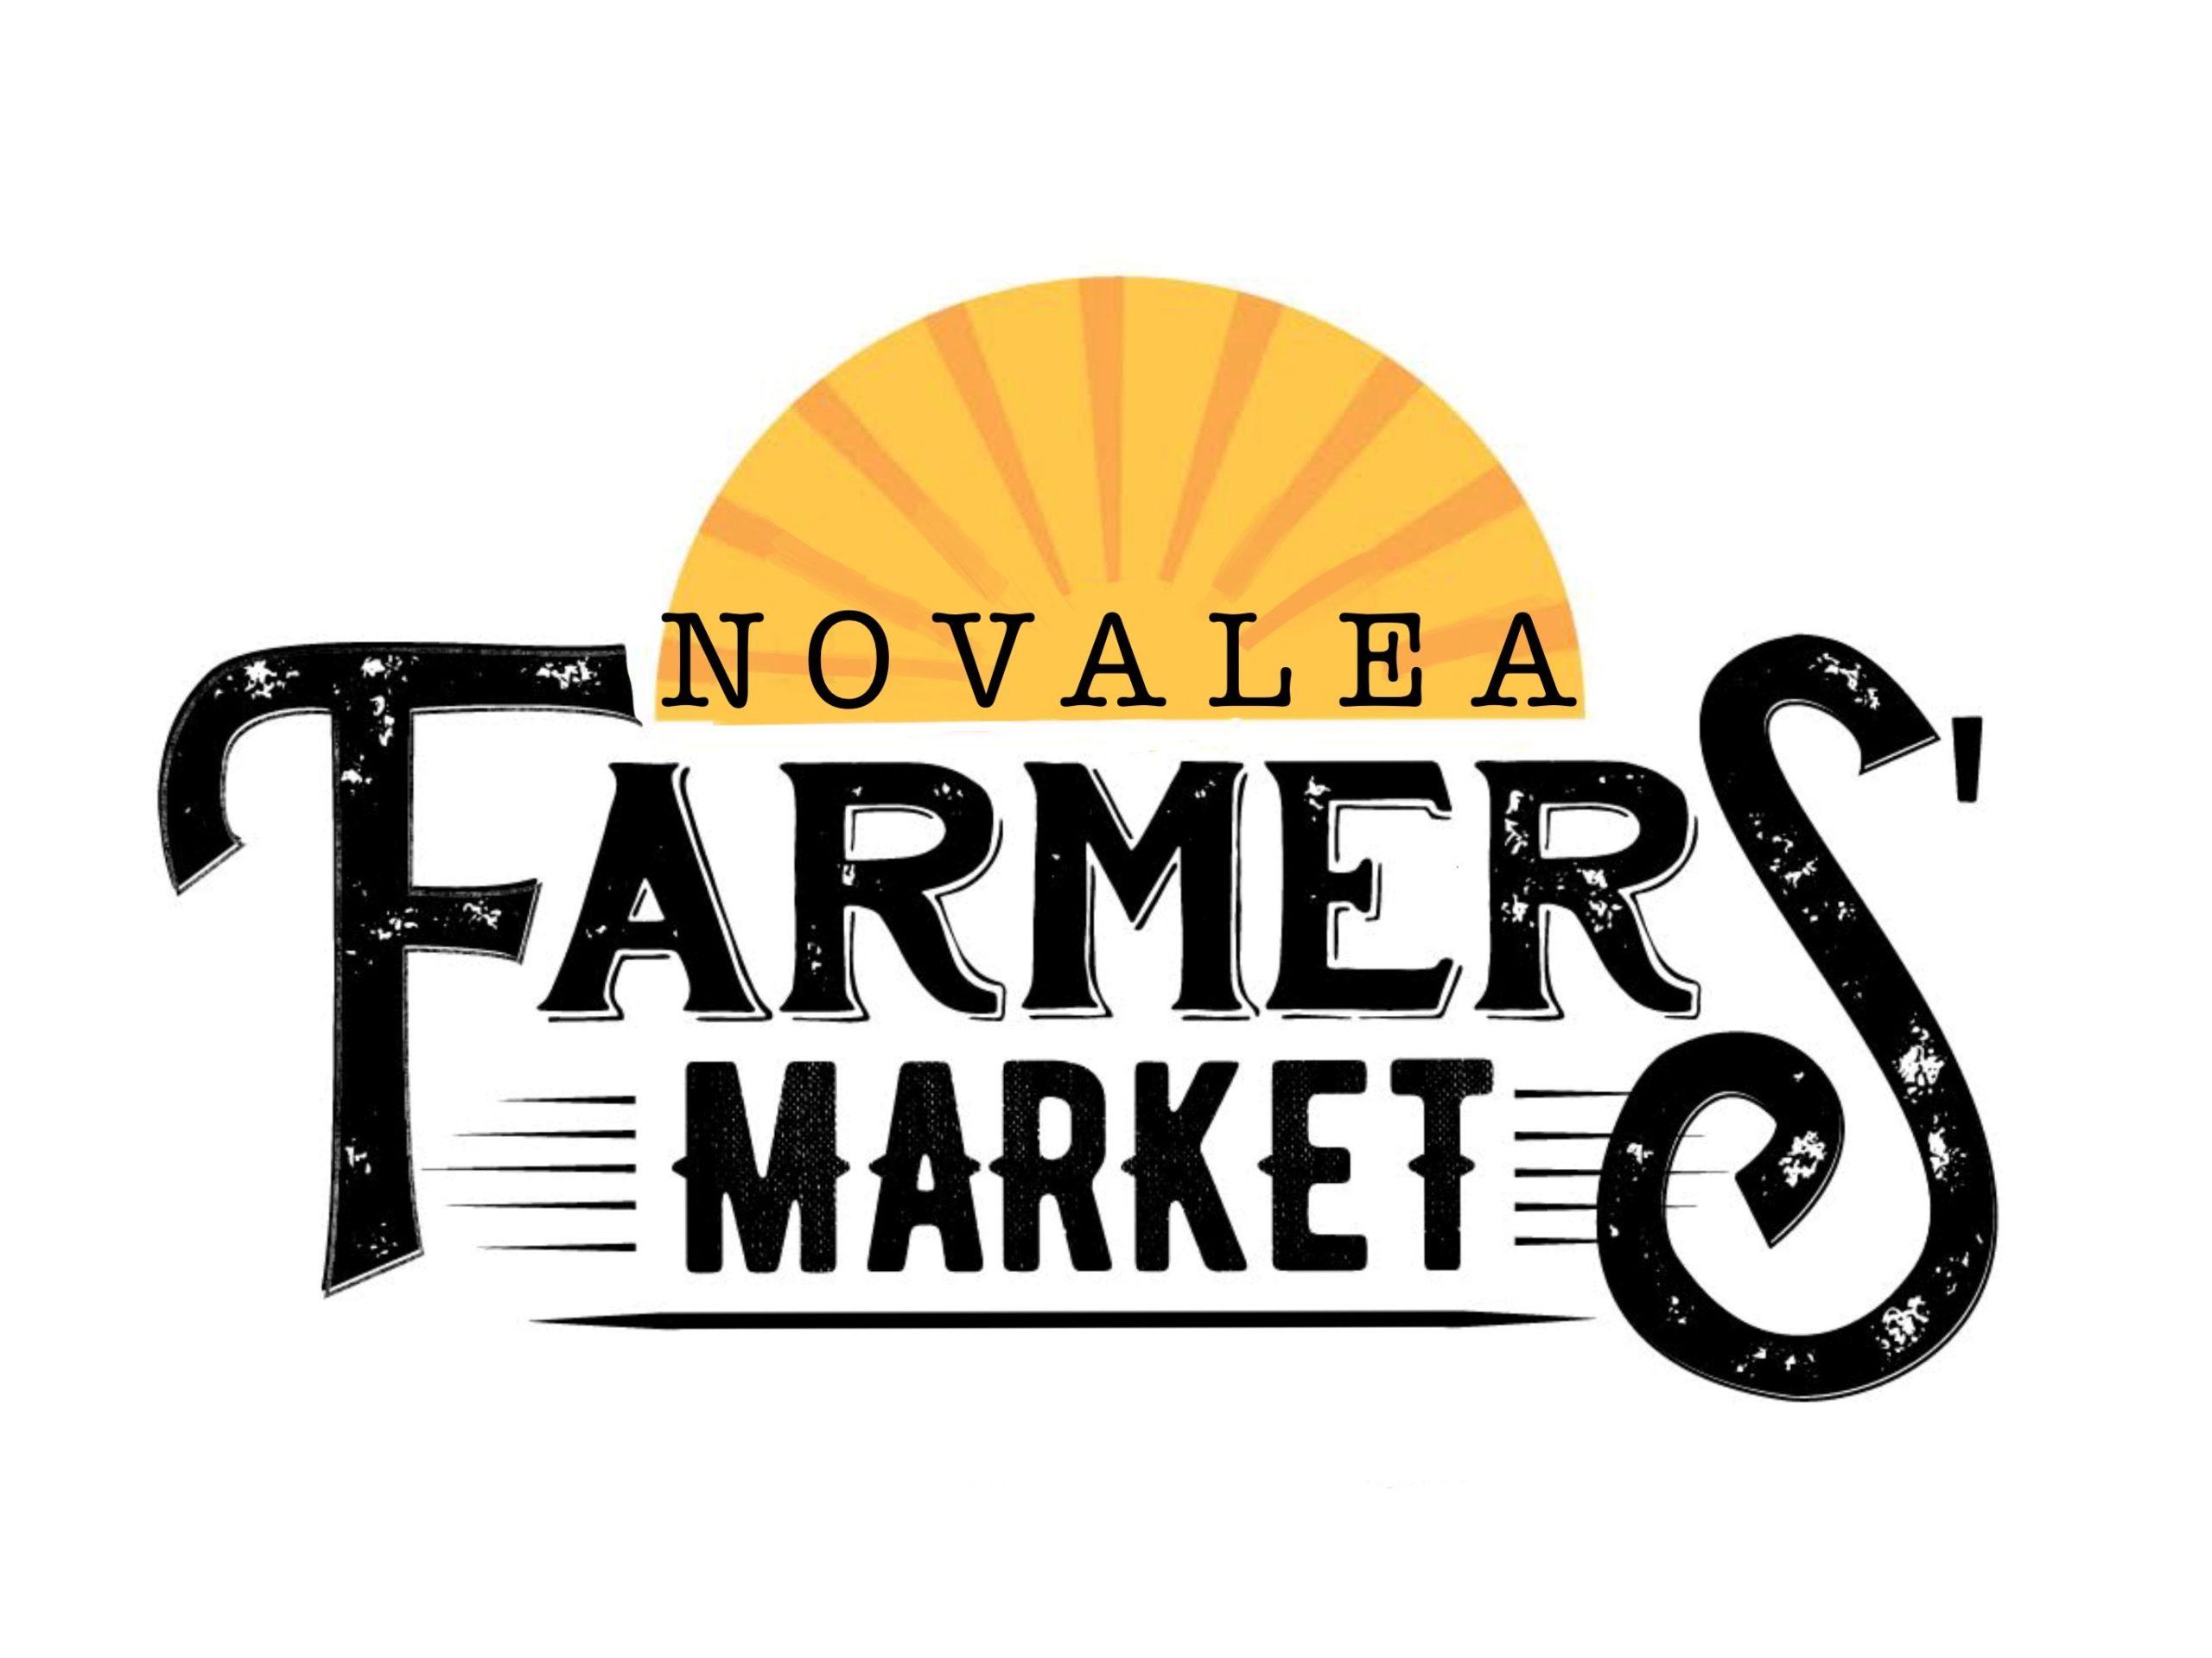 The Novalea Farmers' Market